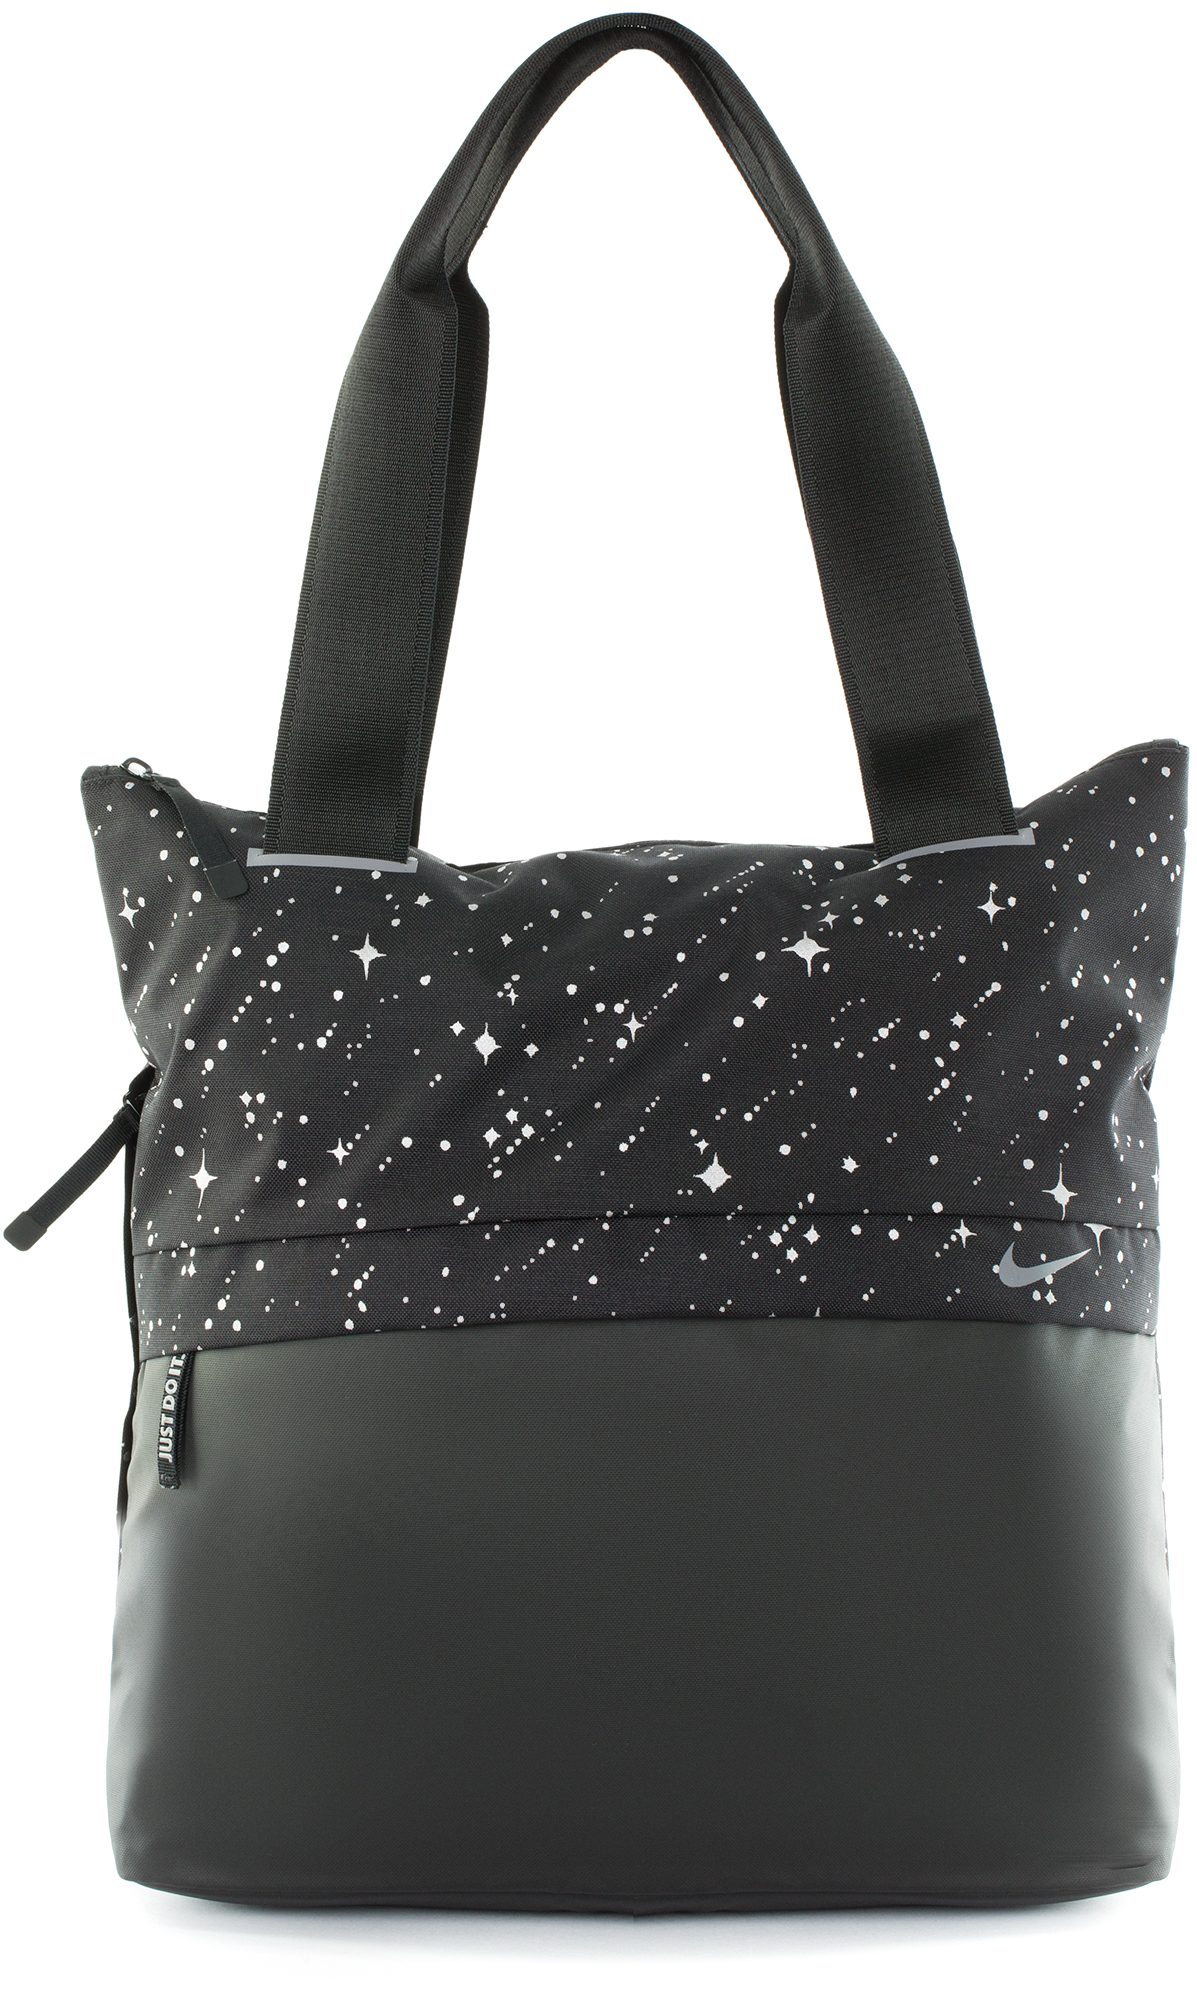 Nike Сумка женская Nike Radiate Tote tote bag with tassel